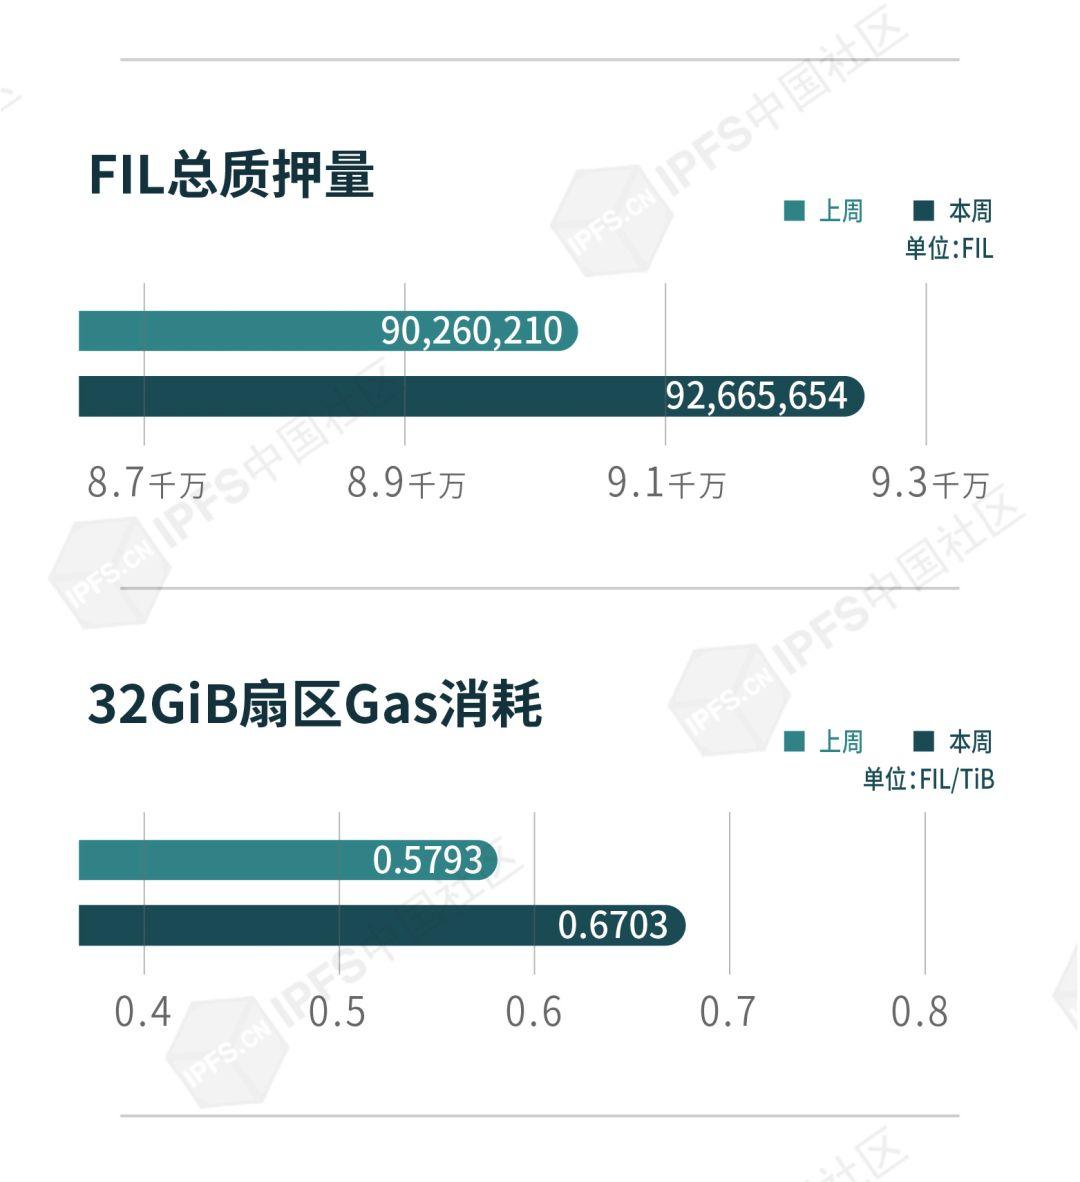 IPFS中国社区:IPFS&Filecoin生态指数周报(07.12-07.19)